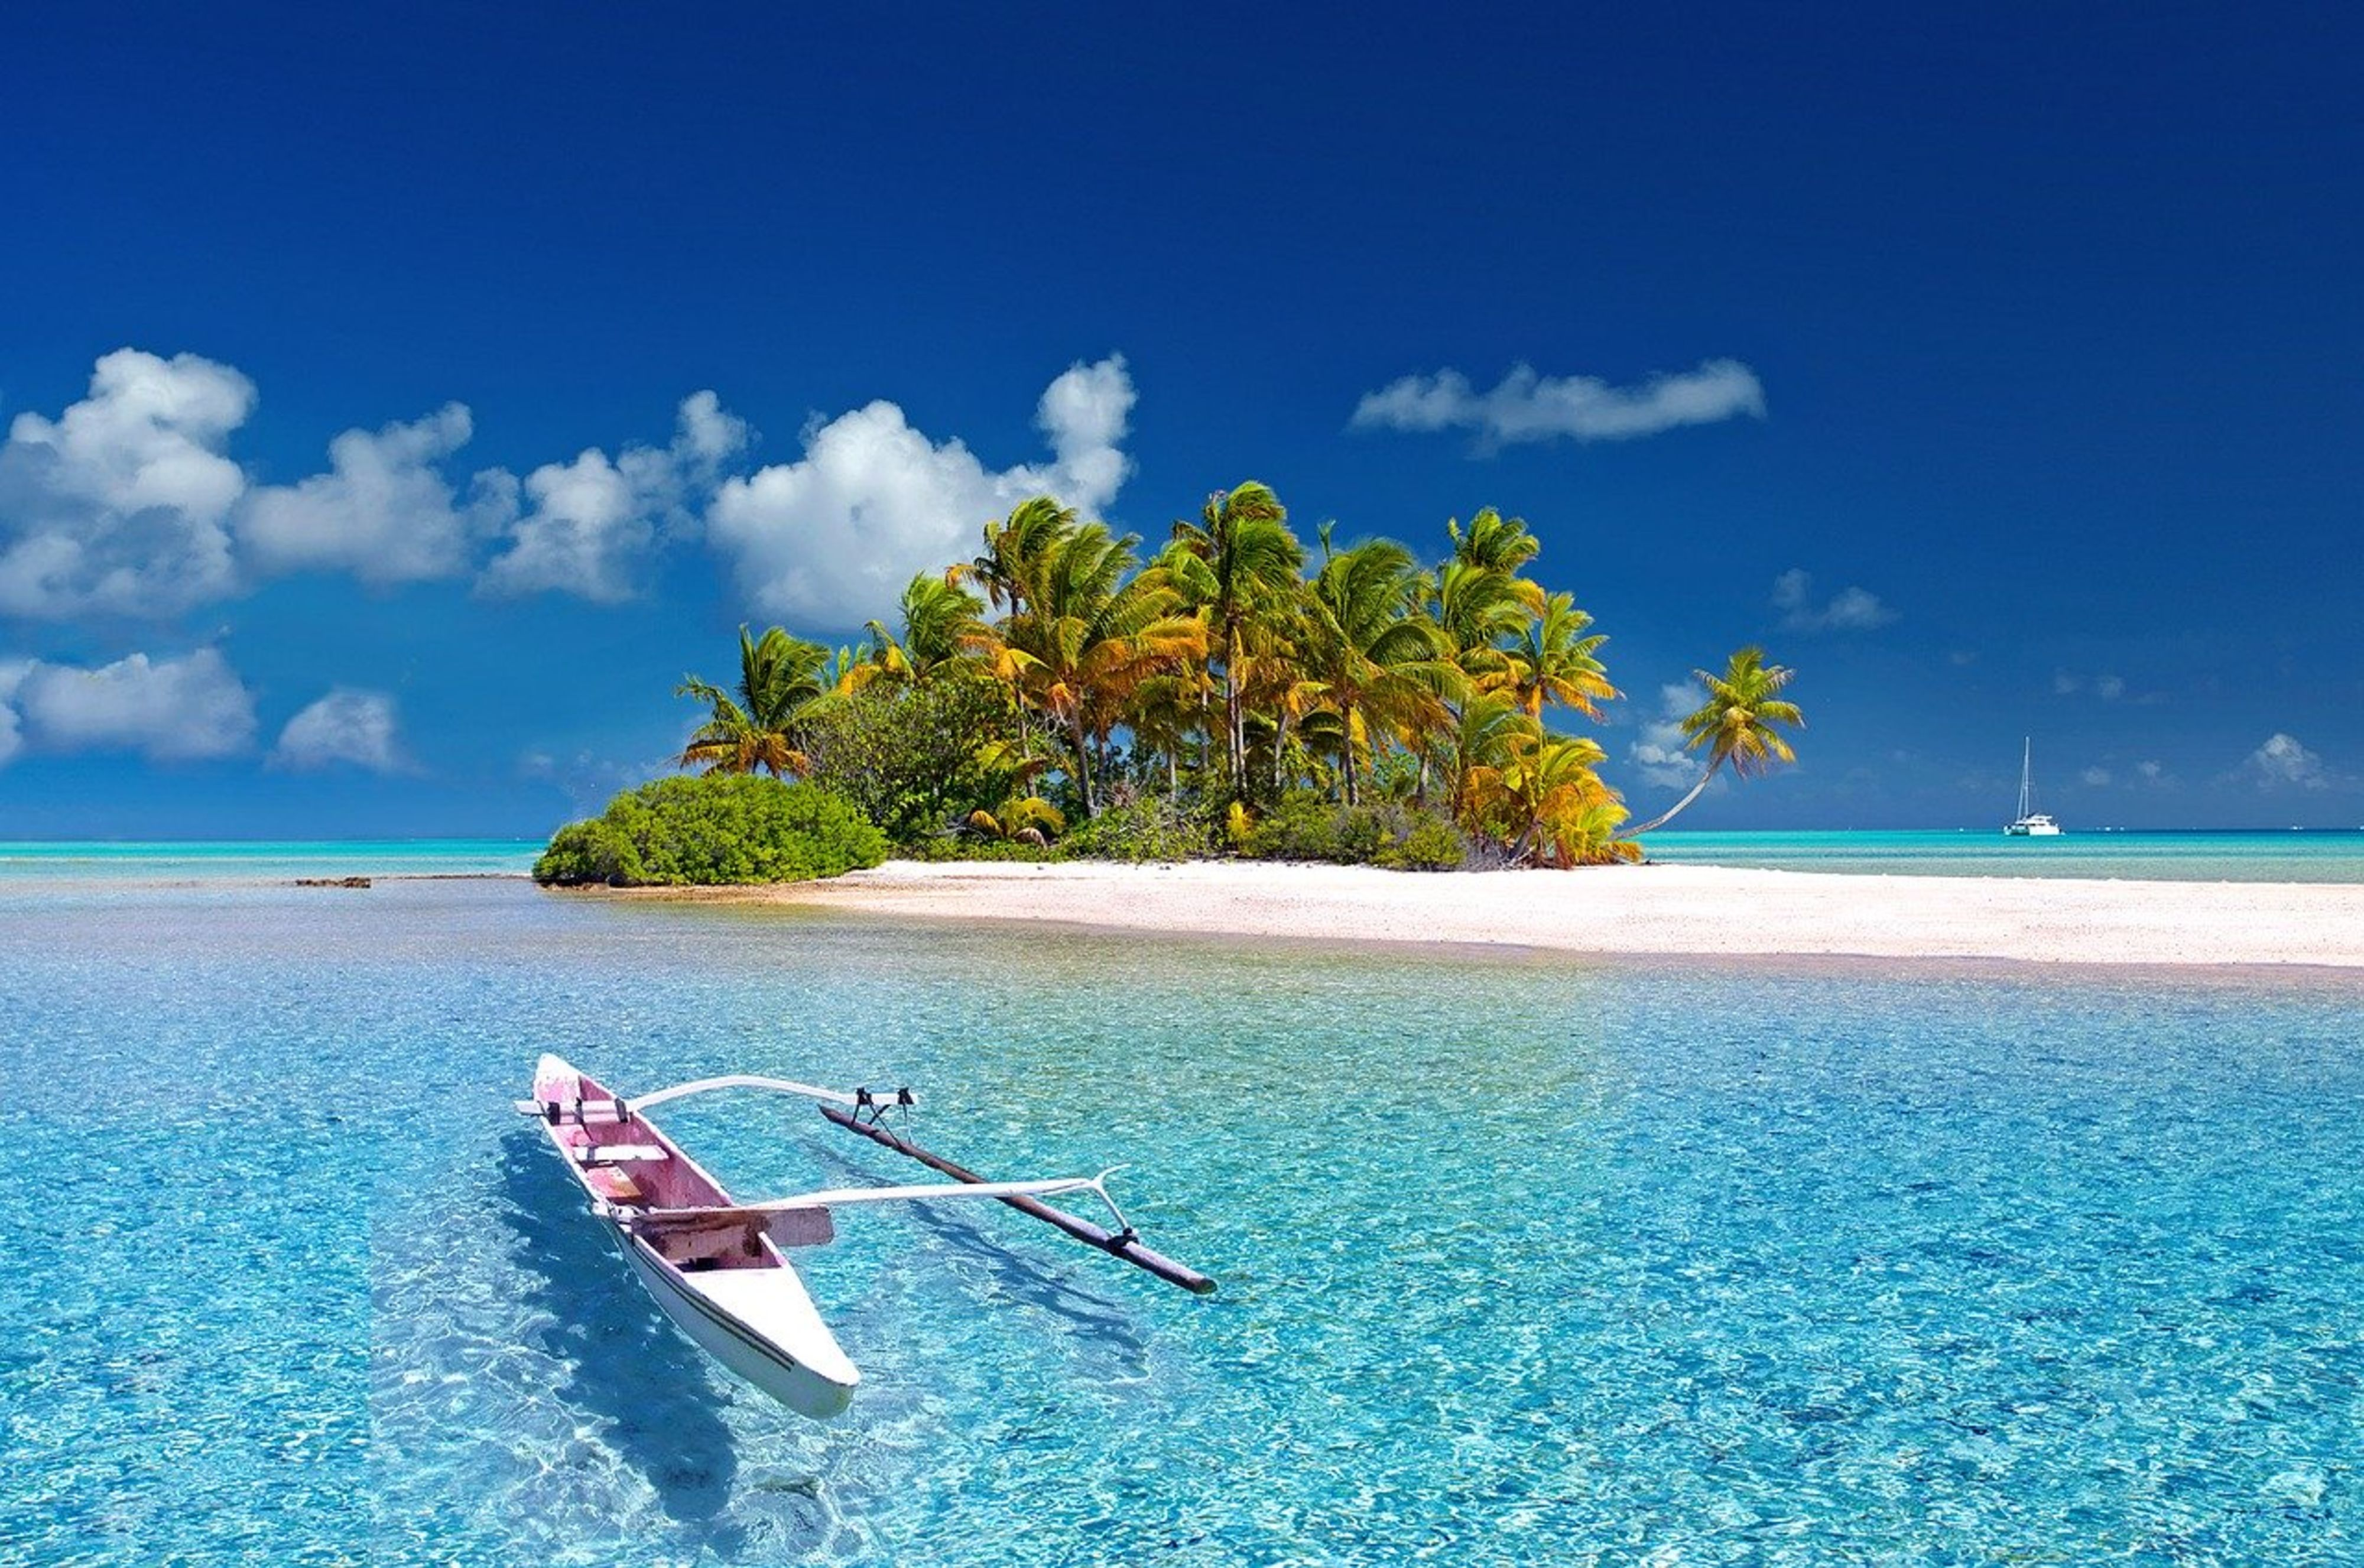 Huwelijksreis Tropisch Eiland